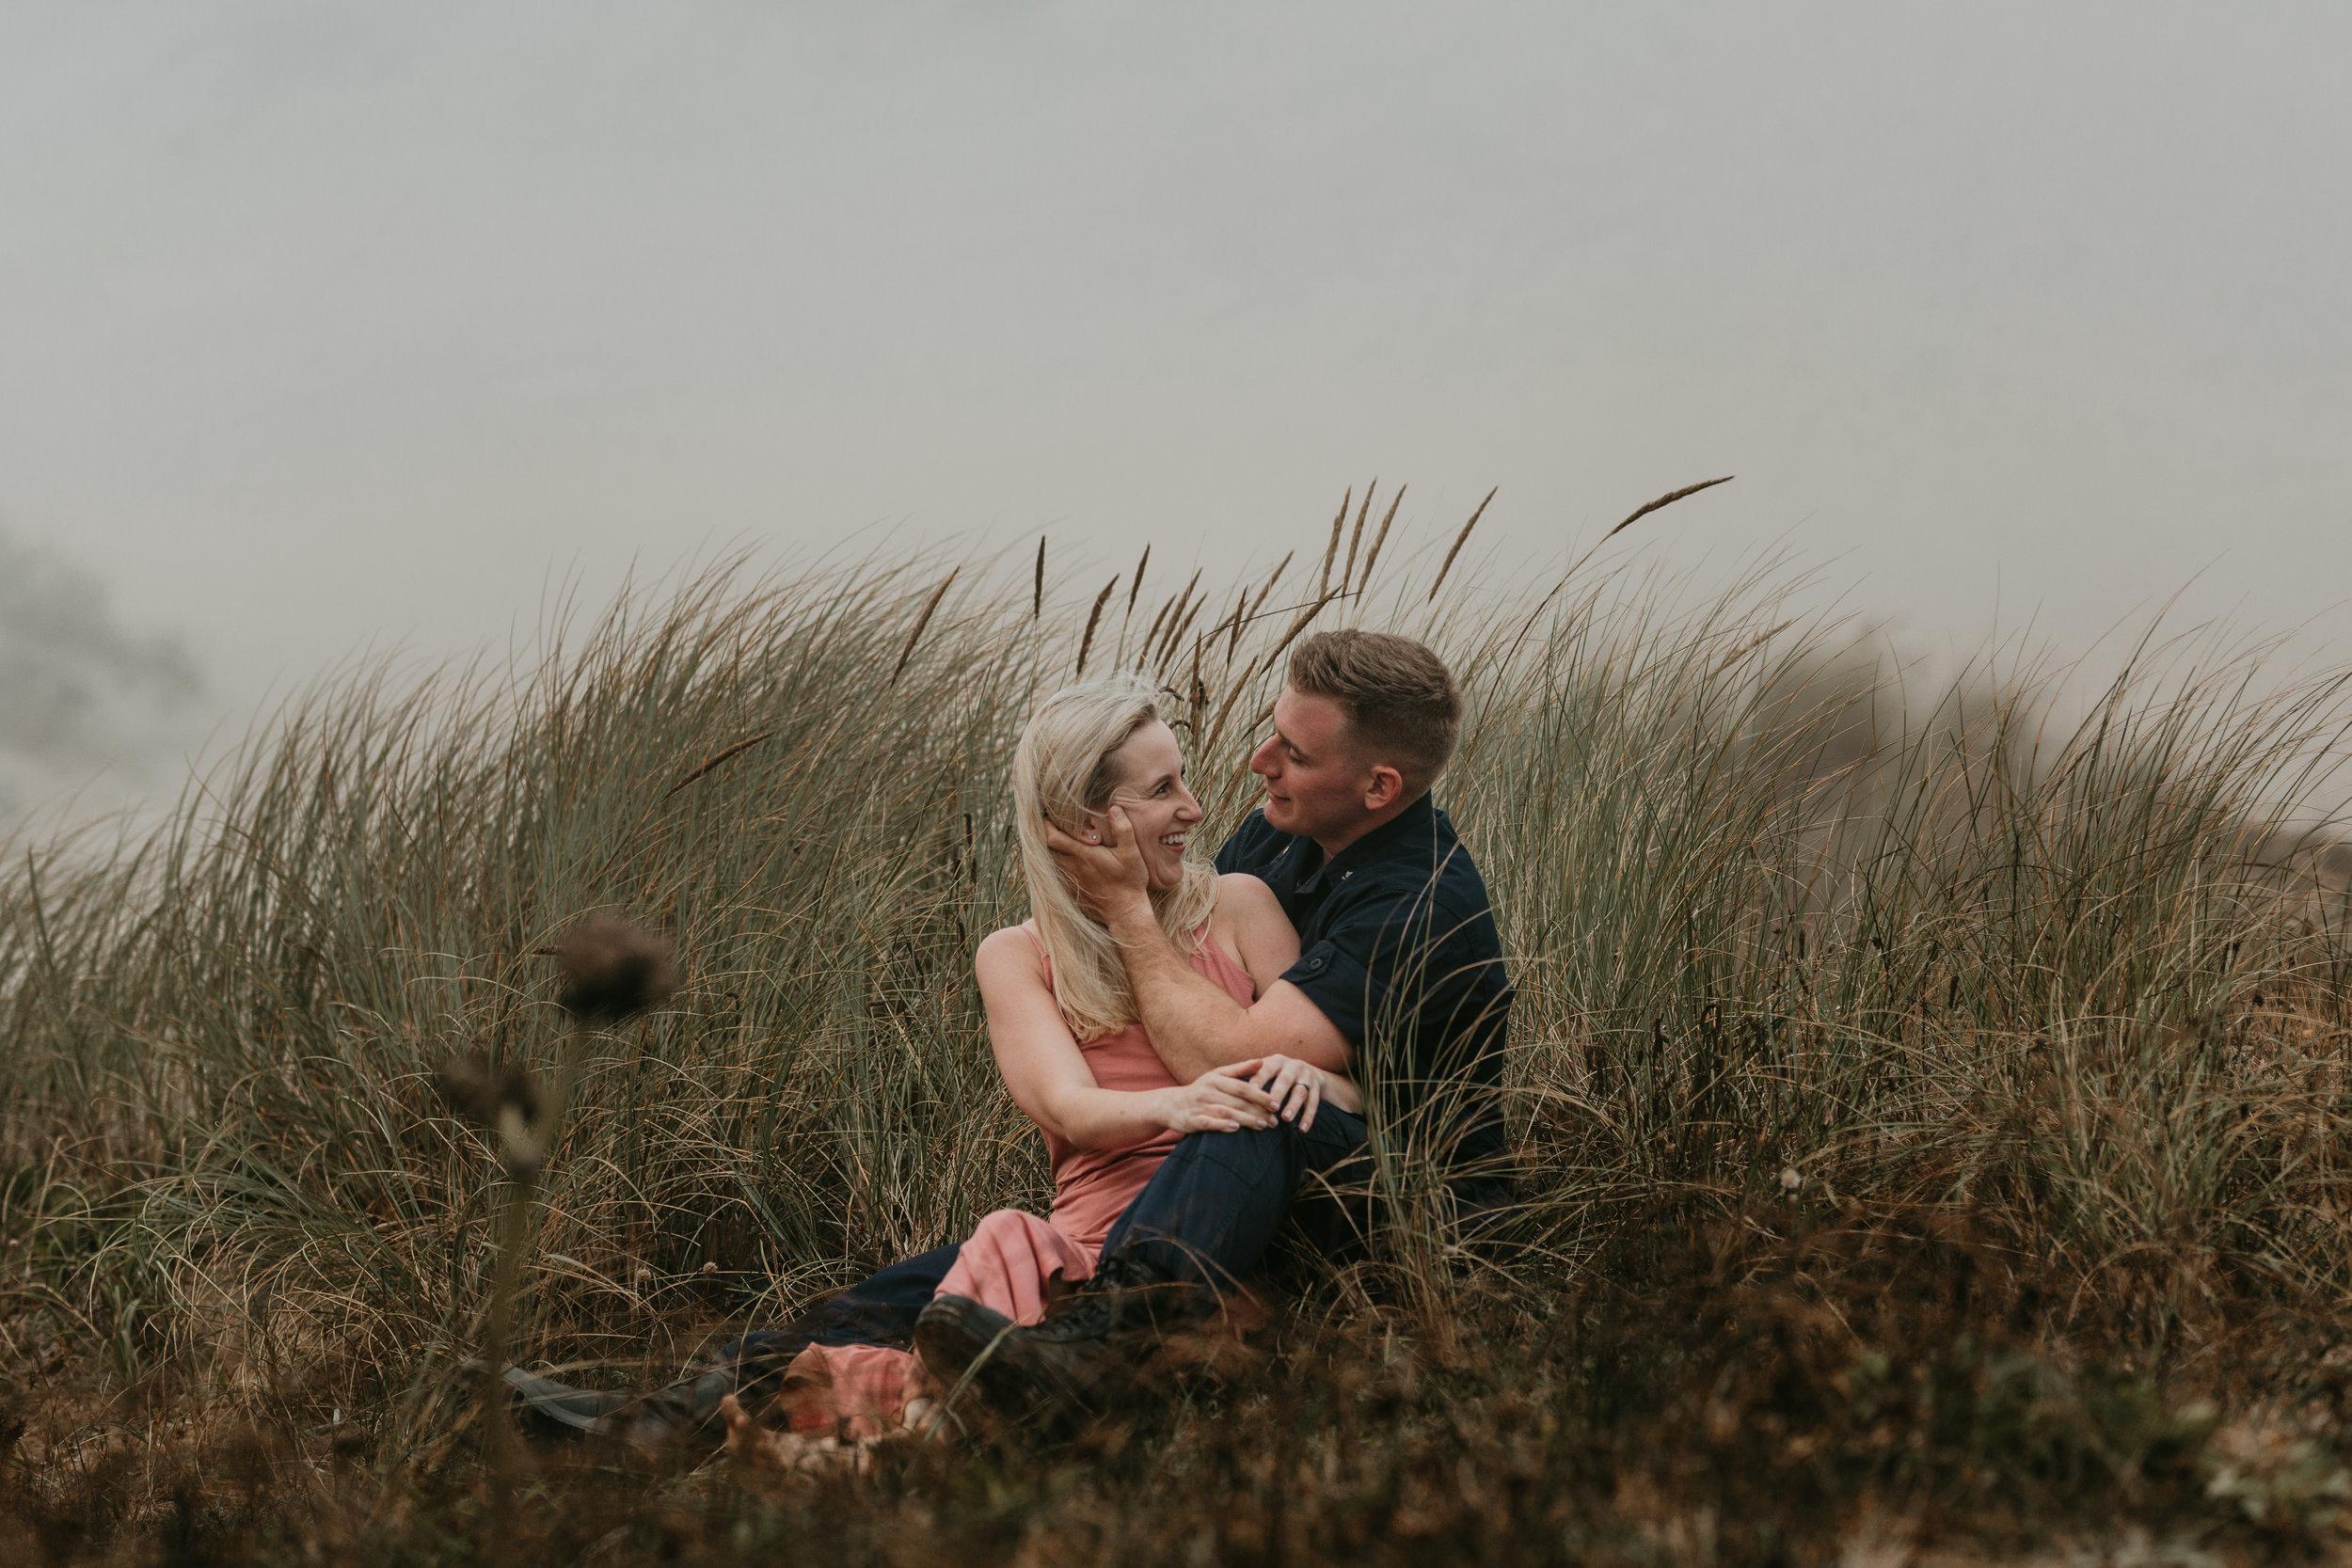 Nicole-daacke-photography-cape-kiwanda-foggy-adventure-session-engagement-session-anniversary-photos-oregon-coast-pacific-city-oregon-elopement-photographer-35.jpg